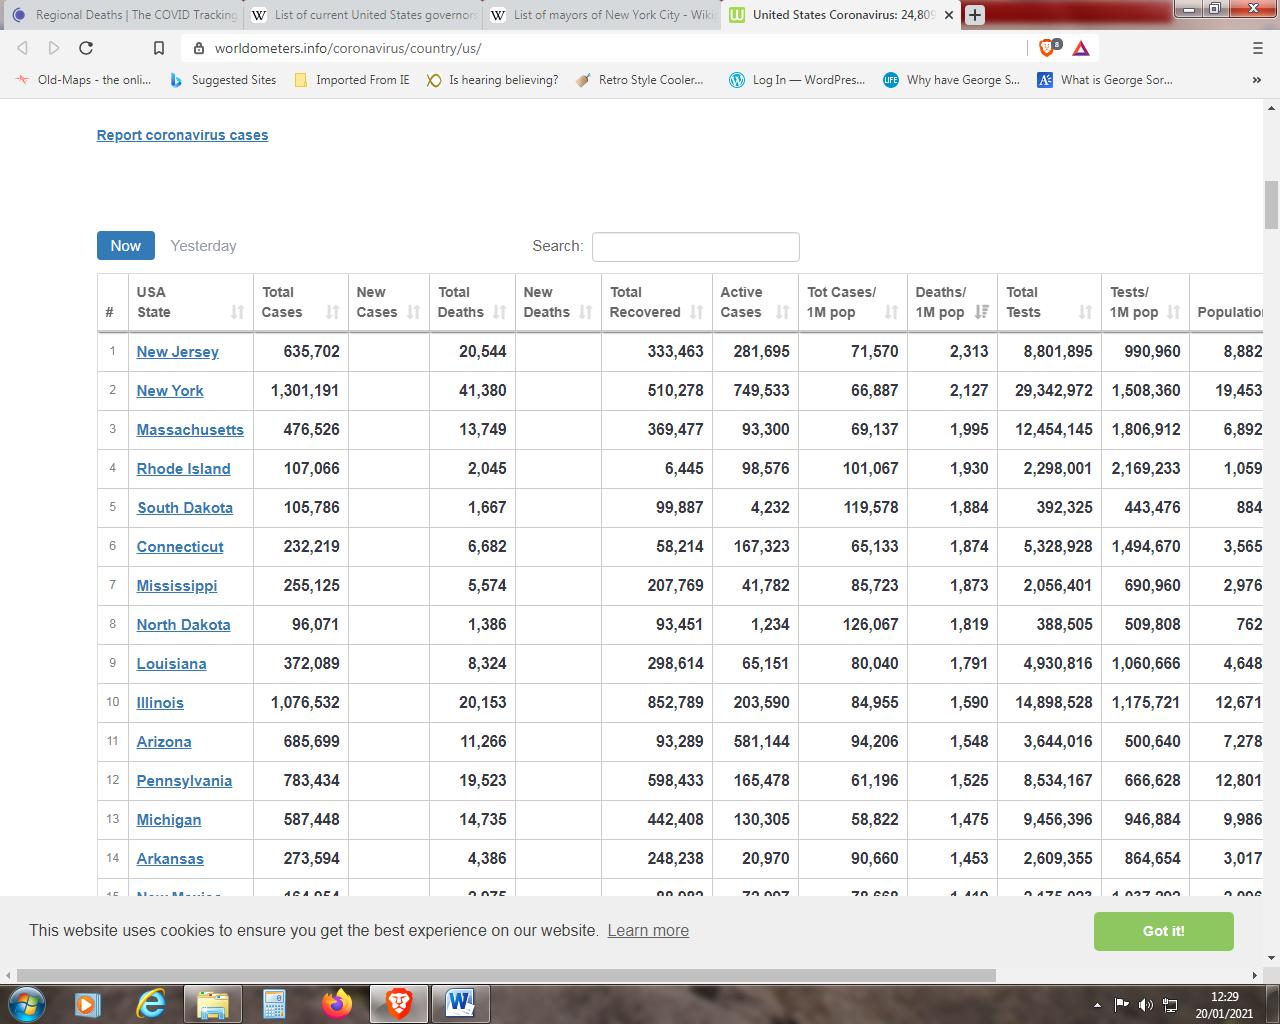 Covid deaths per million USA